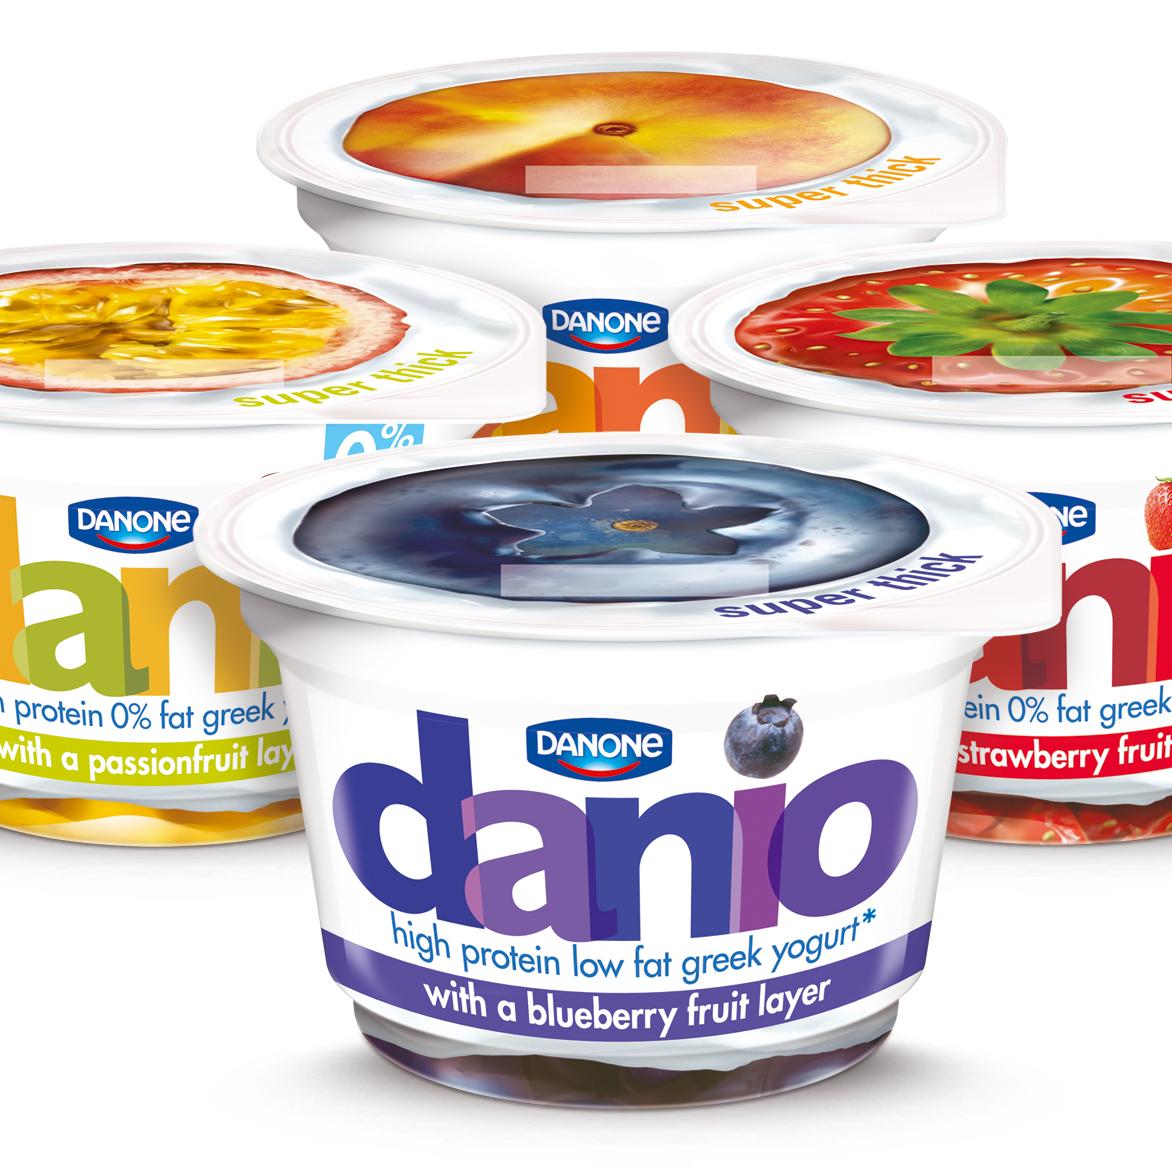 Danone UK Introduces New Yogurt Brand Danio With Packaging